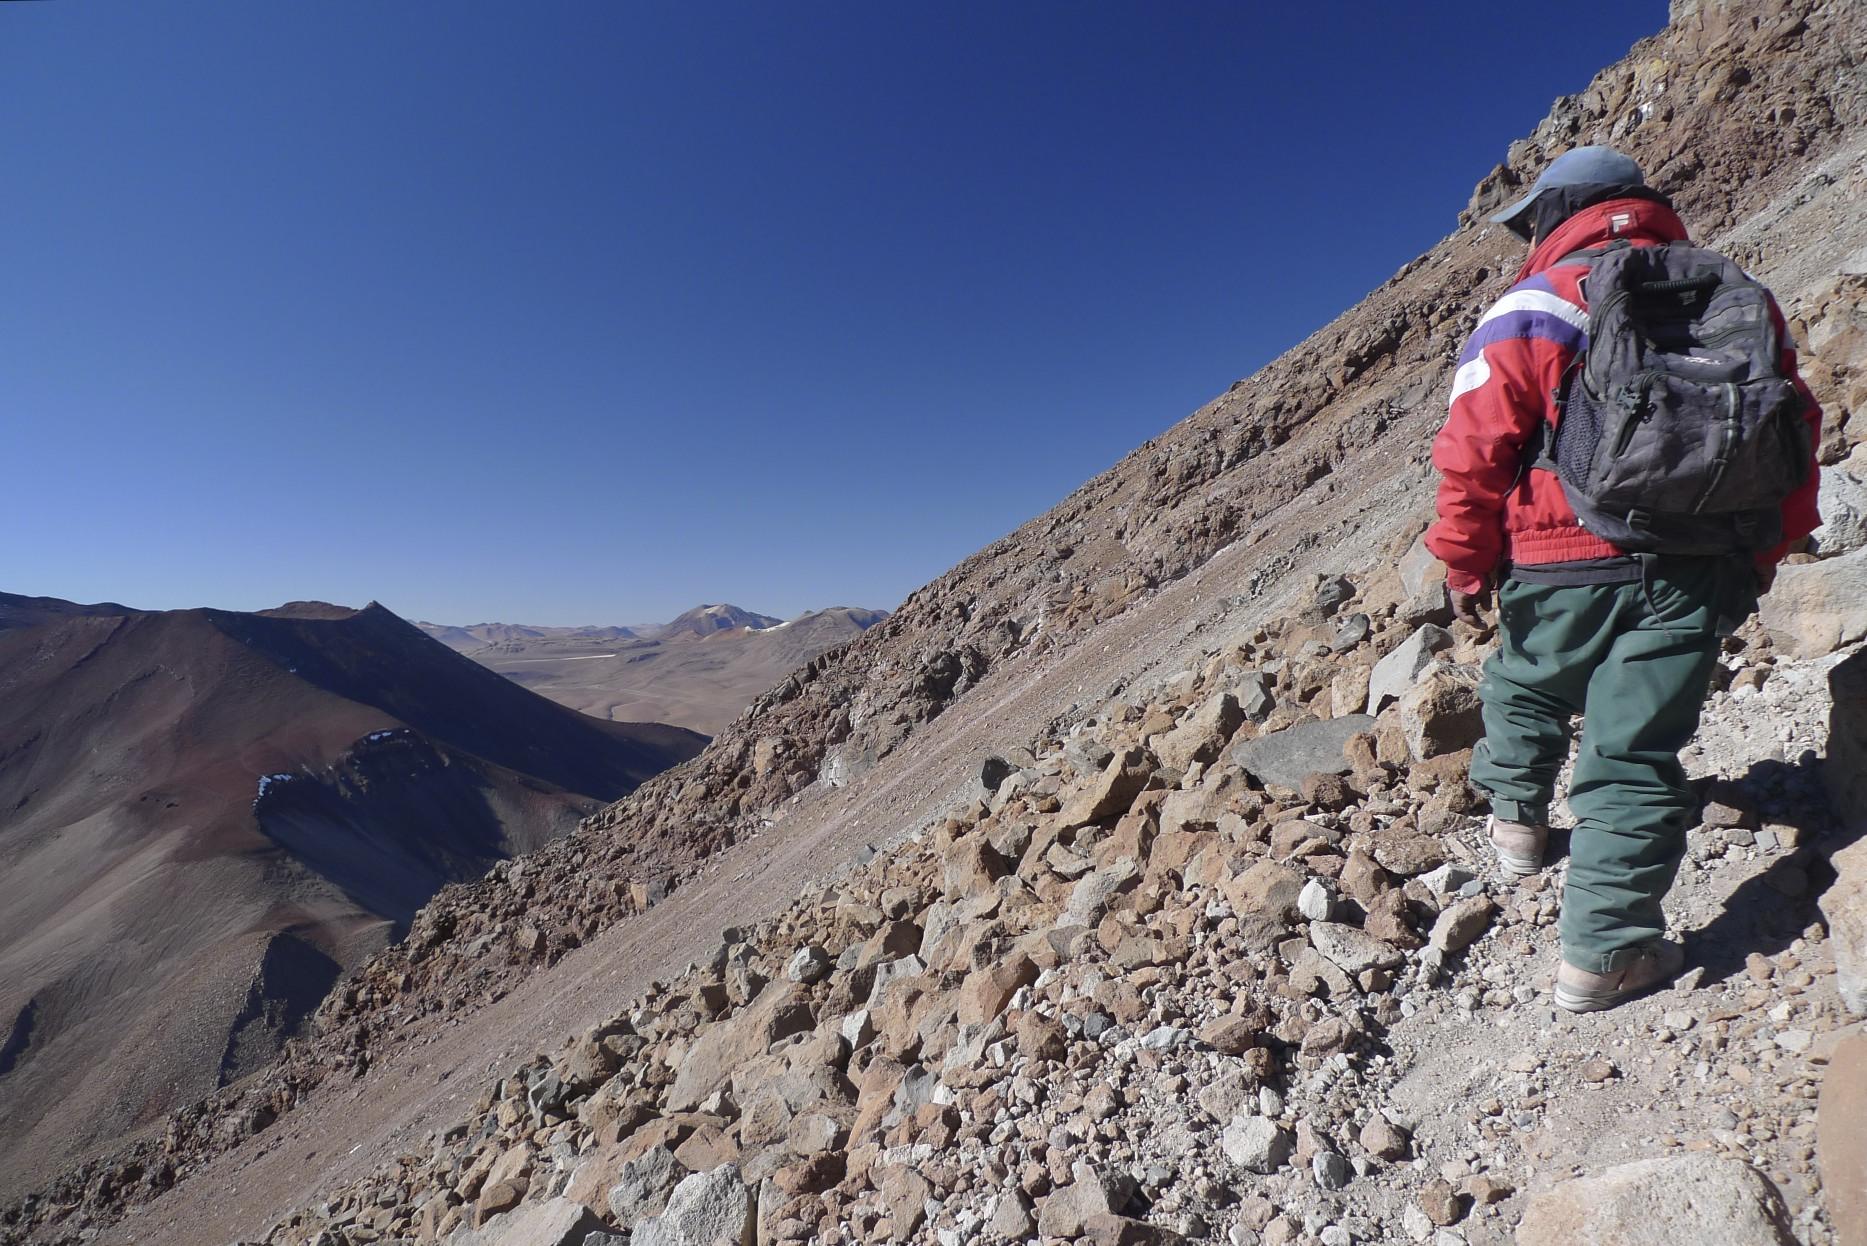 On the slopes of Licancabur Volcano